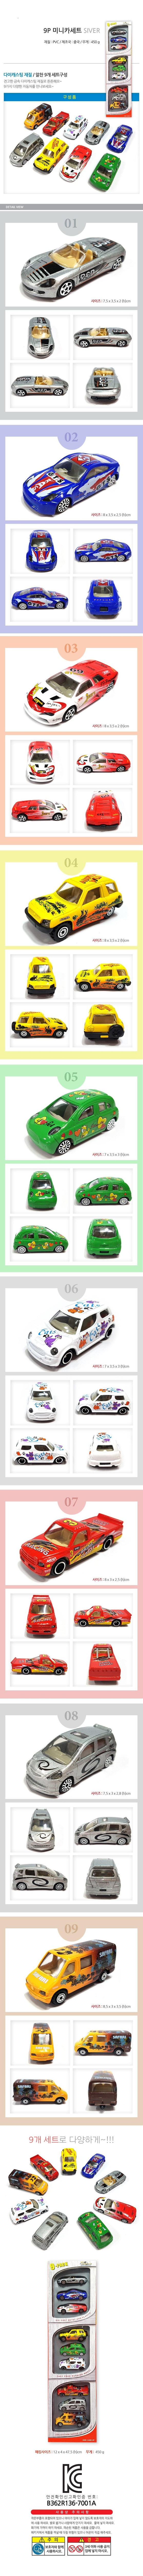 minicar9p_sllber_18000.jpg